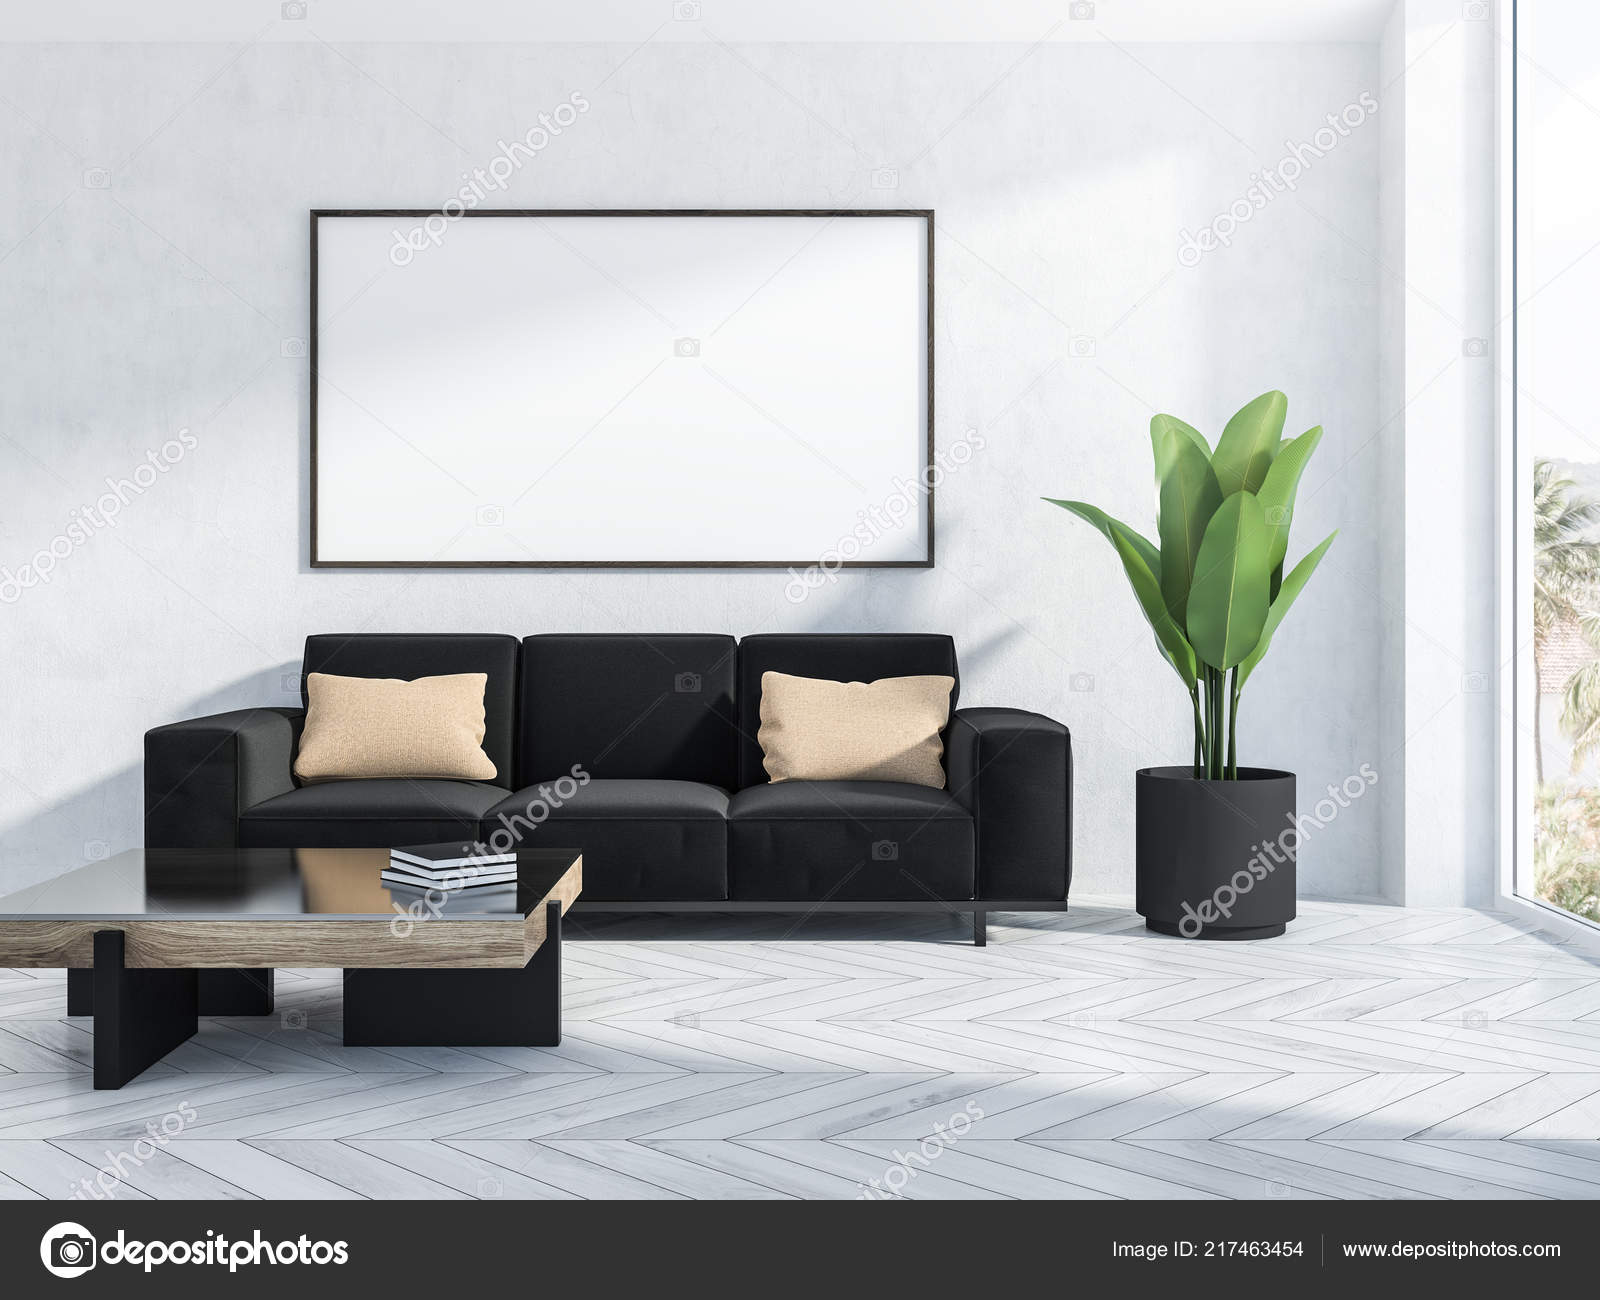 Interior Living Room White Walls White Wooden Floor Black Couch Stock Photo C Denisismagilov 217463454